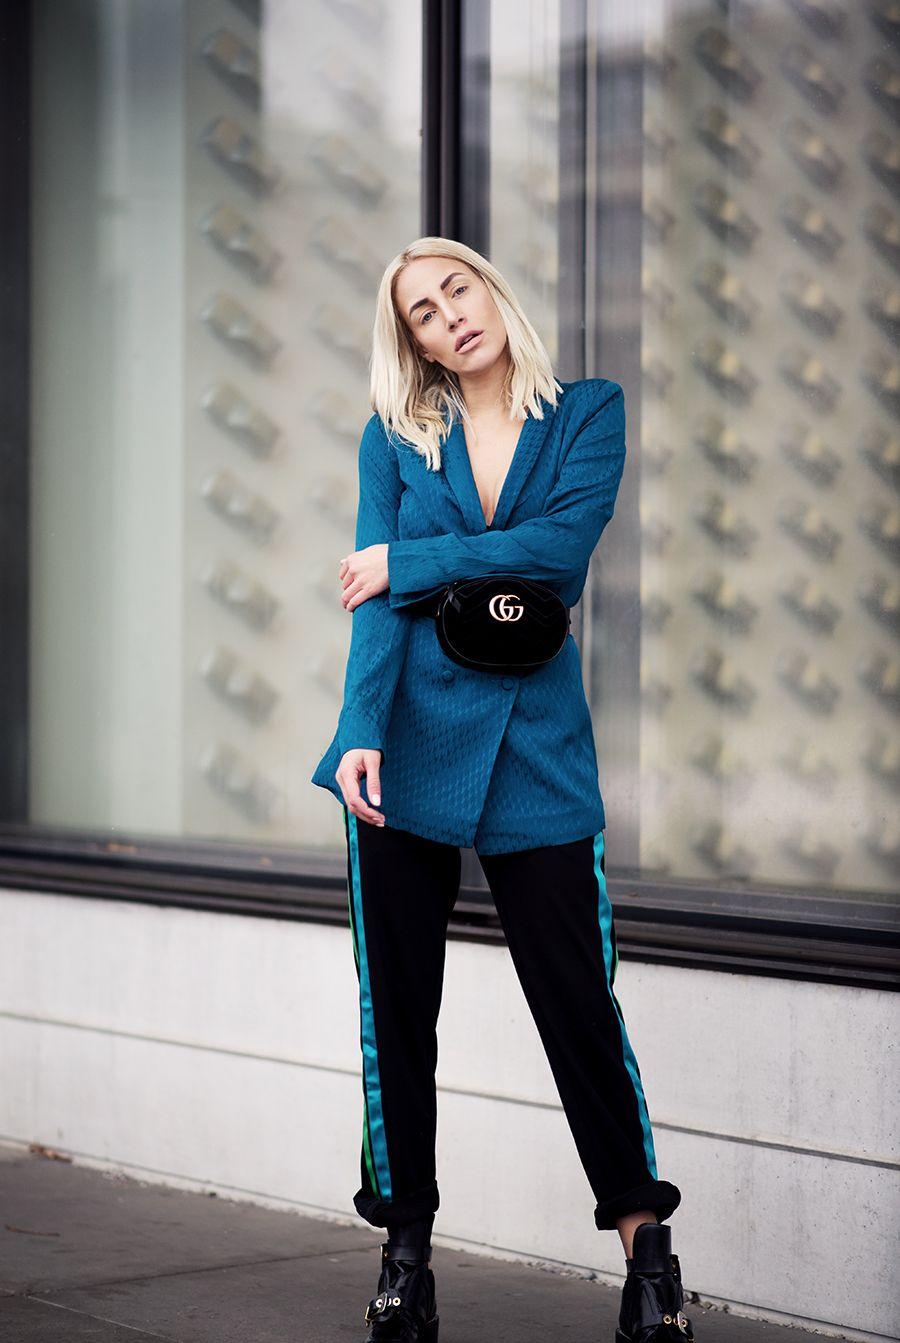 Fashion Blogger Sequinsophia From Theskinnyandthecurvyone Gucci Meitaviamp039s Kulot Denim Midi Culottes Belt Bag Gestuz Blazer Look Outfit